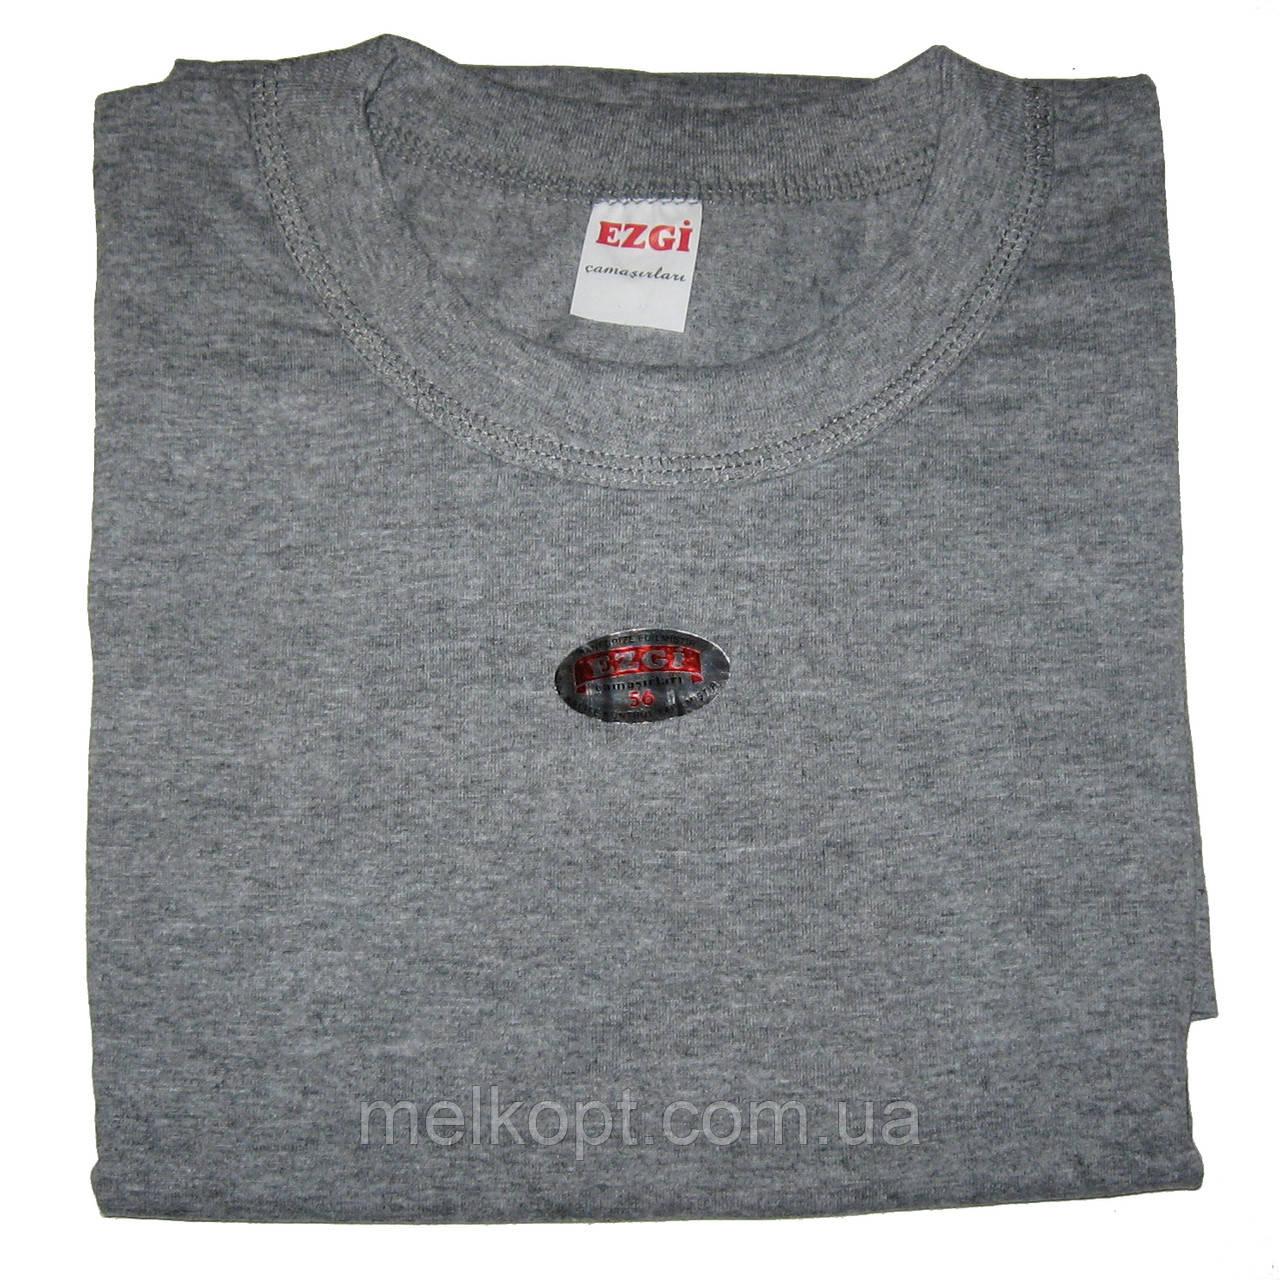 Мужские футболки Ezgi - 68,00 грн./шт. (75-й размер, серые)